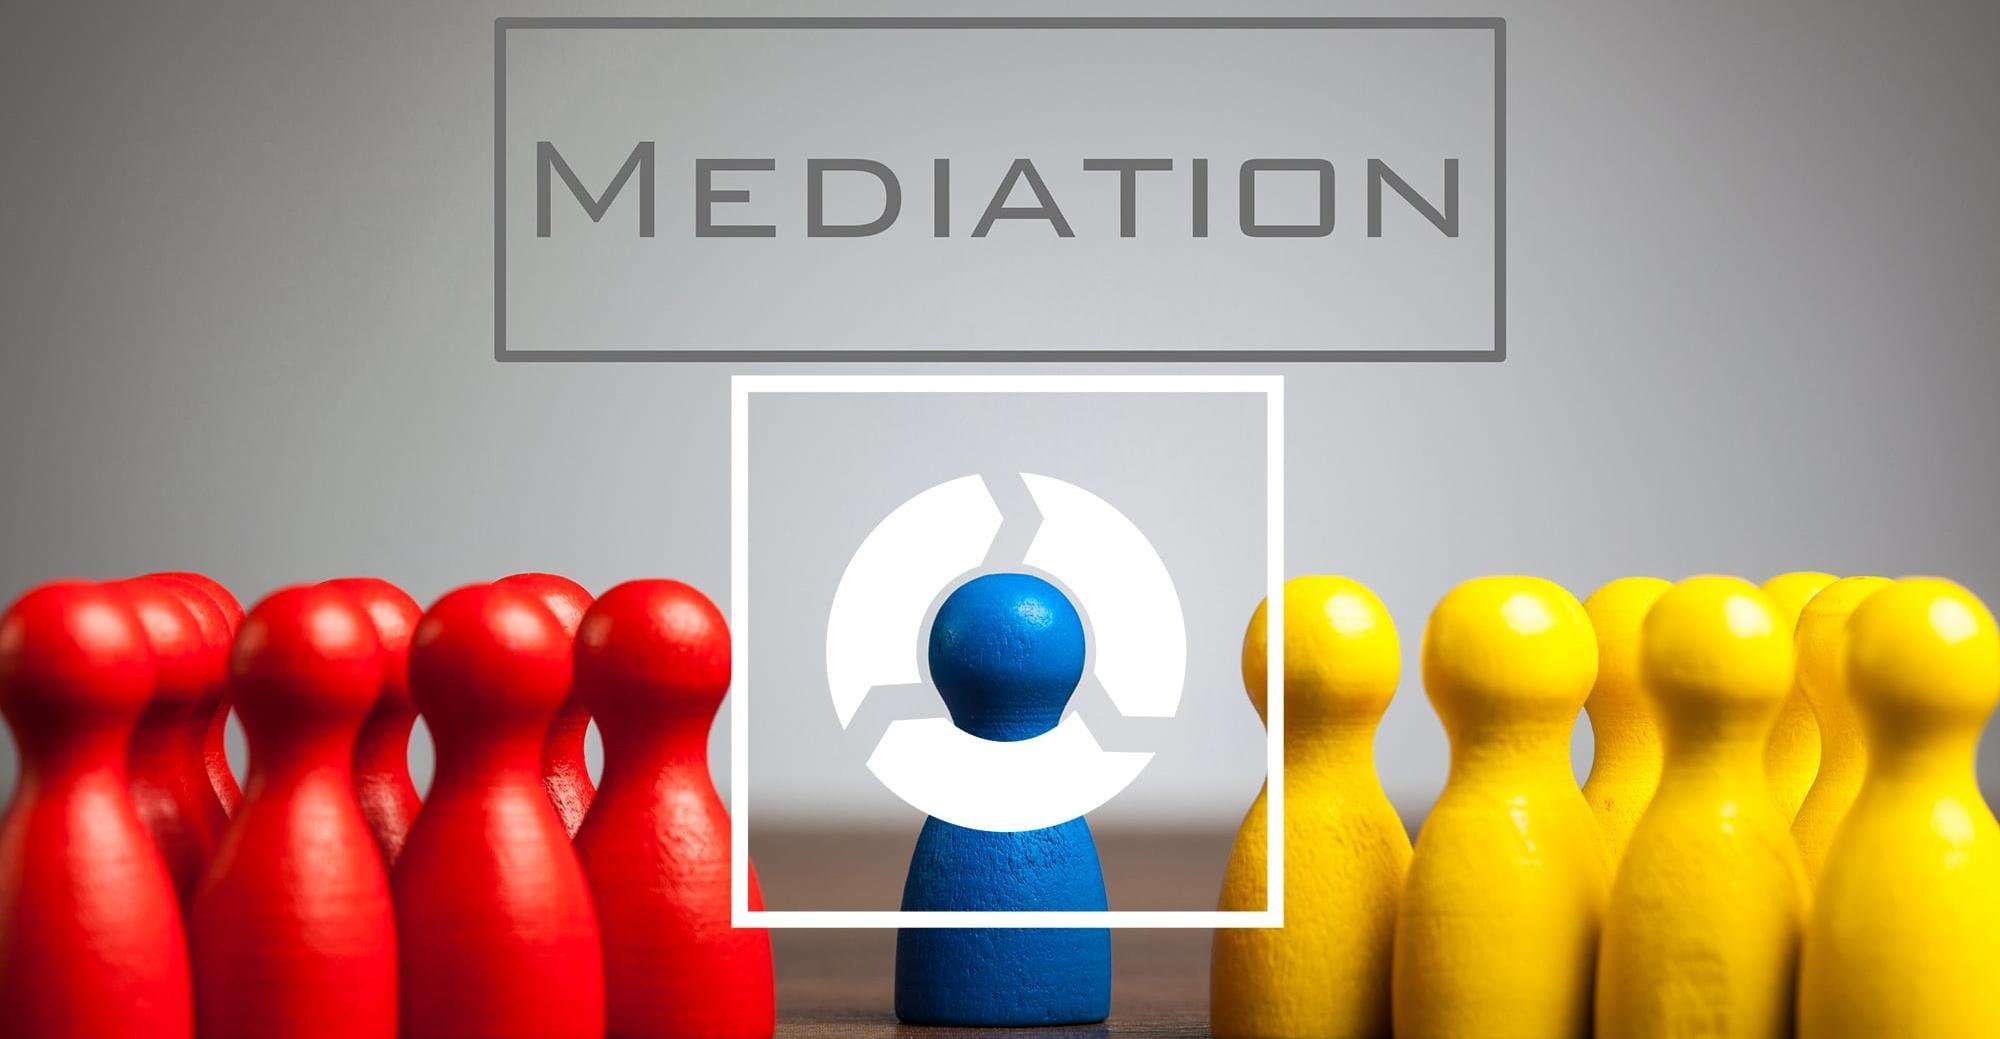 civil mediation image